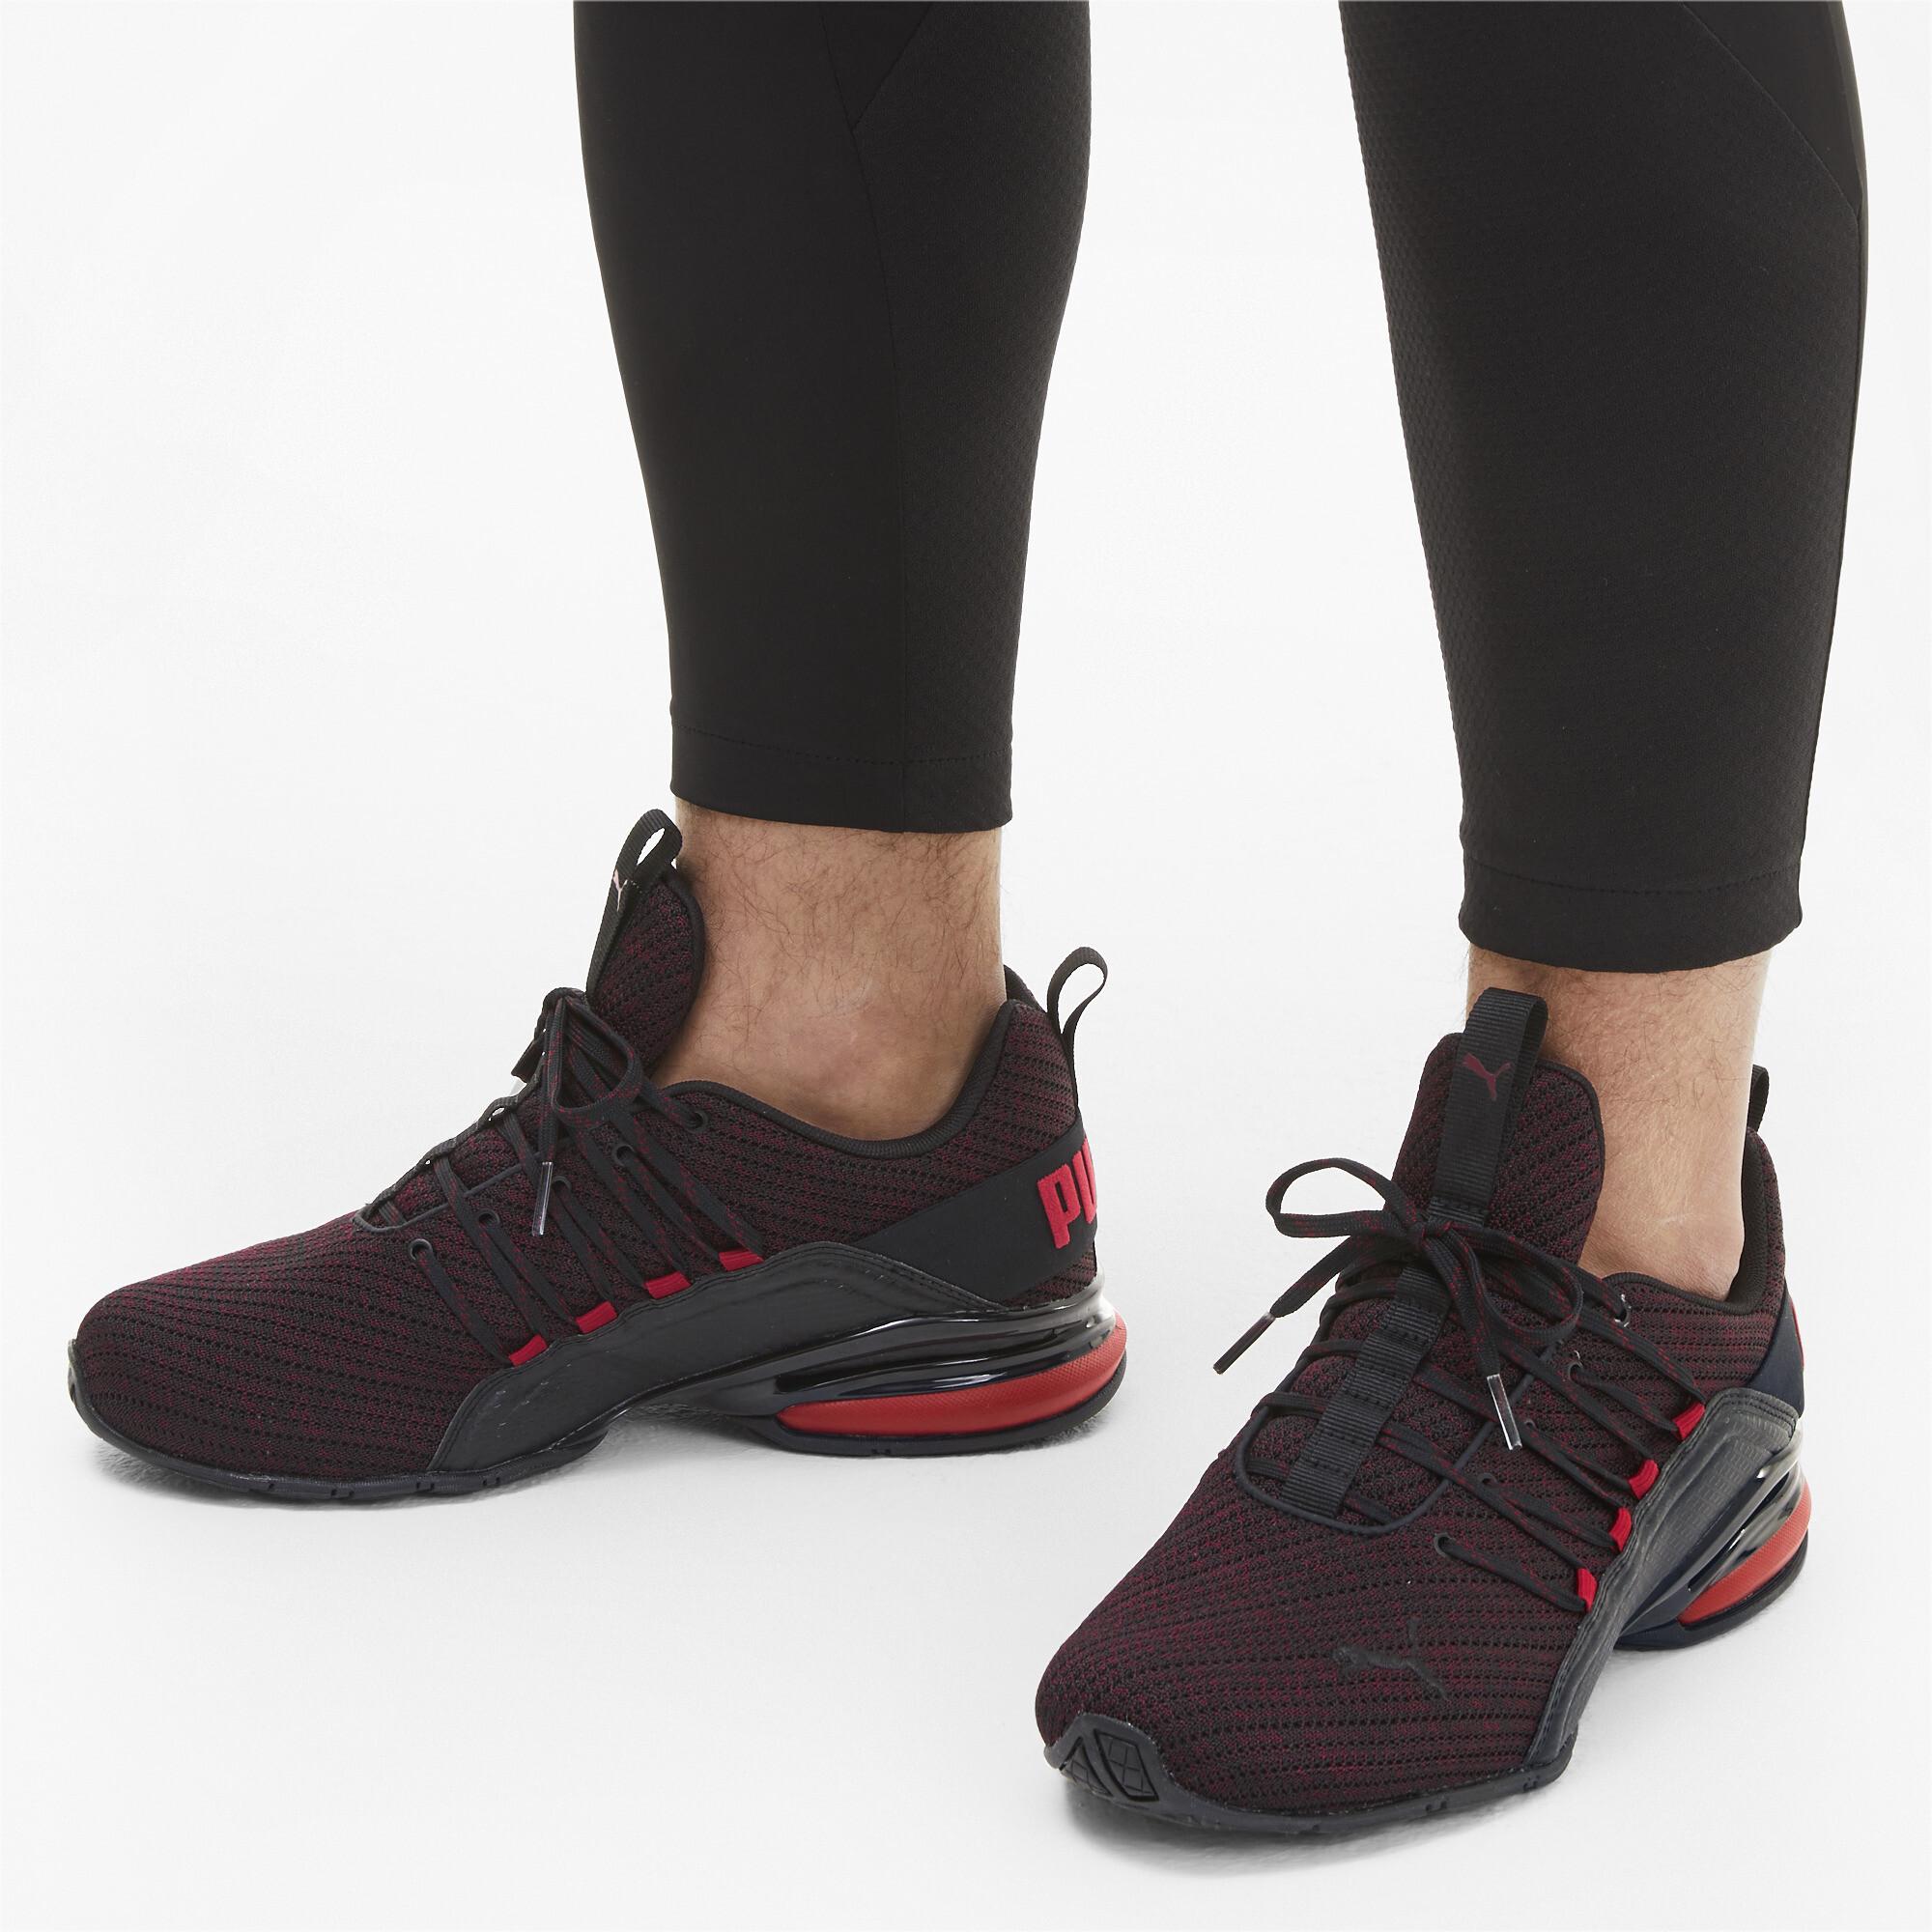 PUMA-Men-039-s-Axelion-Ultra-Running-Shoes thumbnail 12